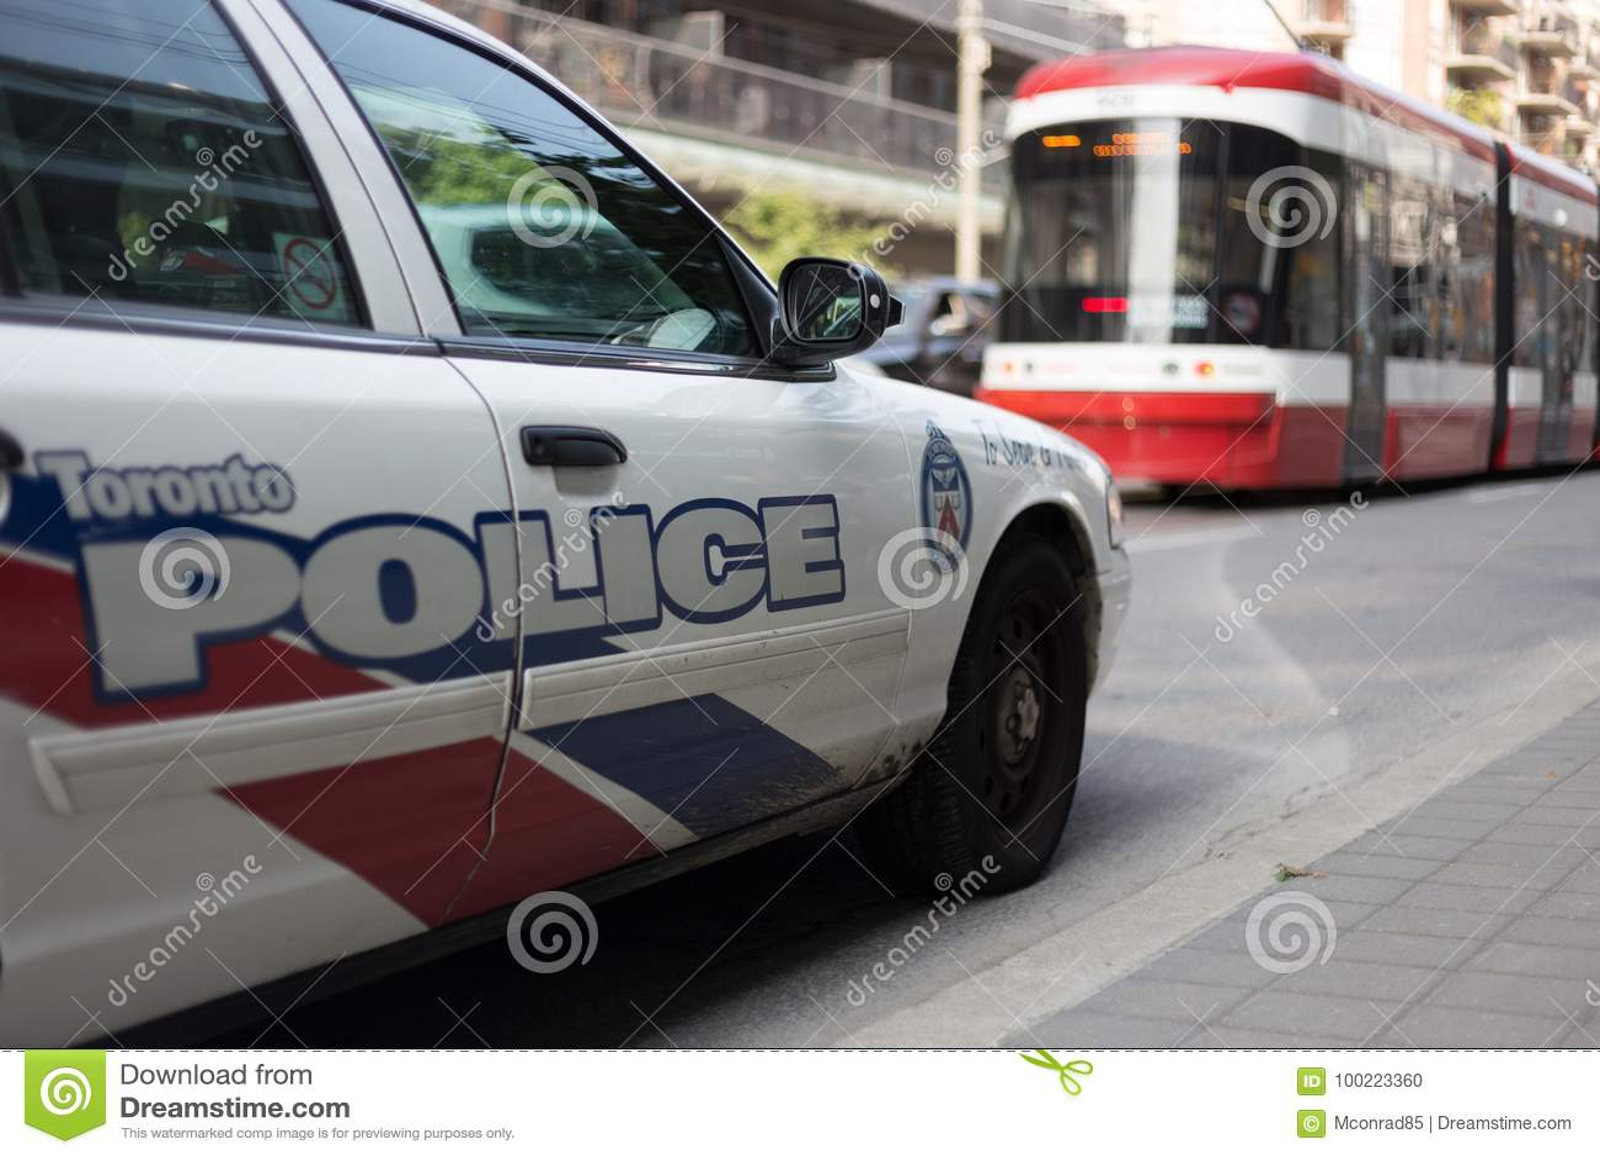 Toronto, ON, Canada - September 18, 2017 police car in traffic s